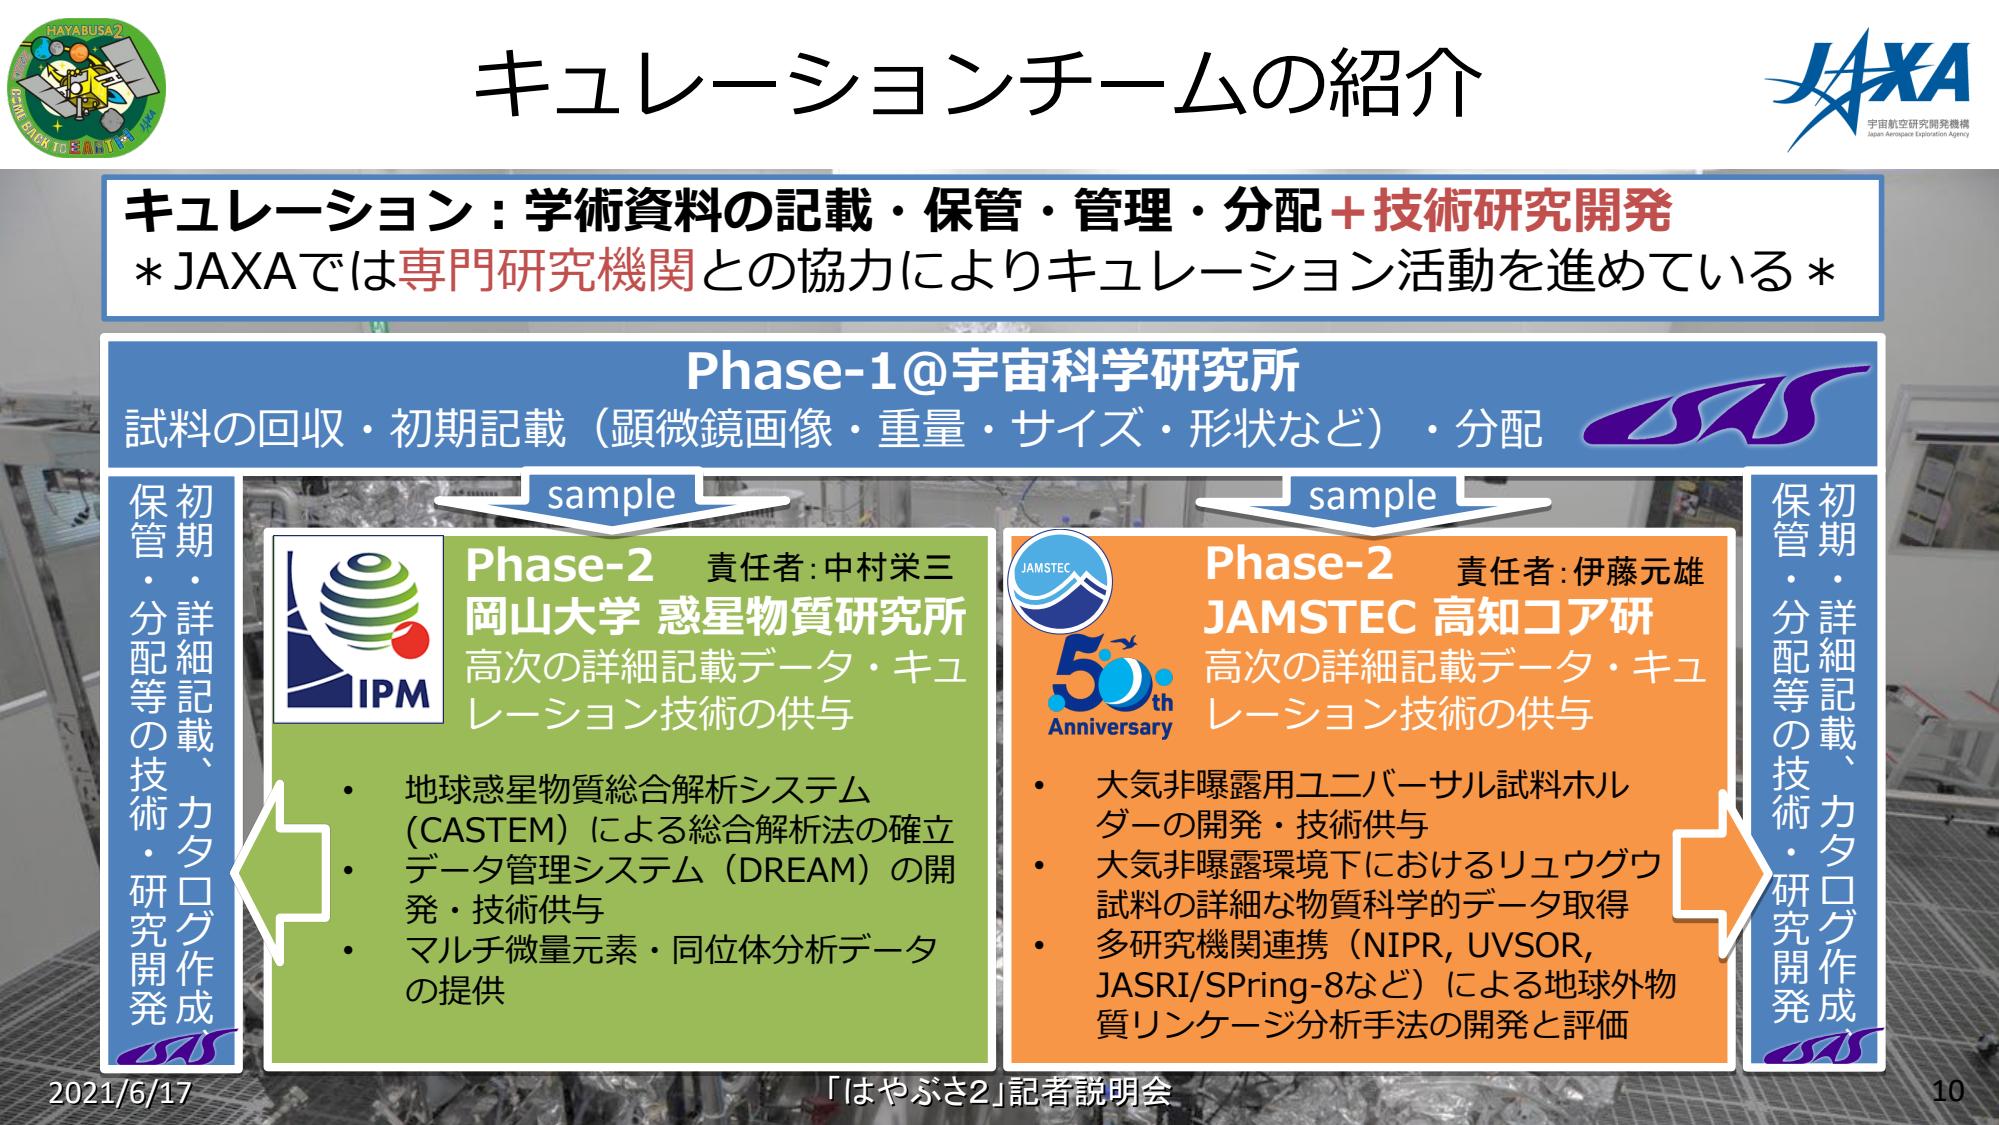 f:id:Imamura:20210617130214p:plain